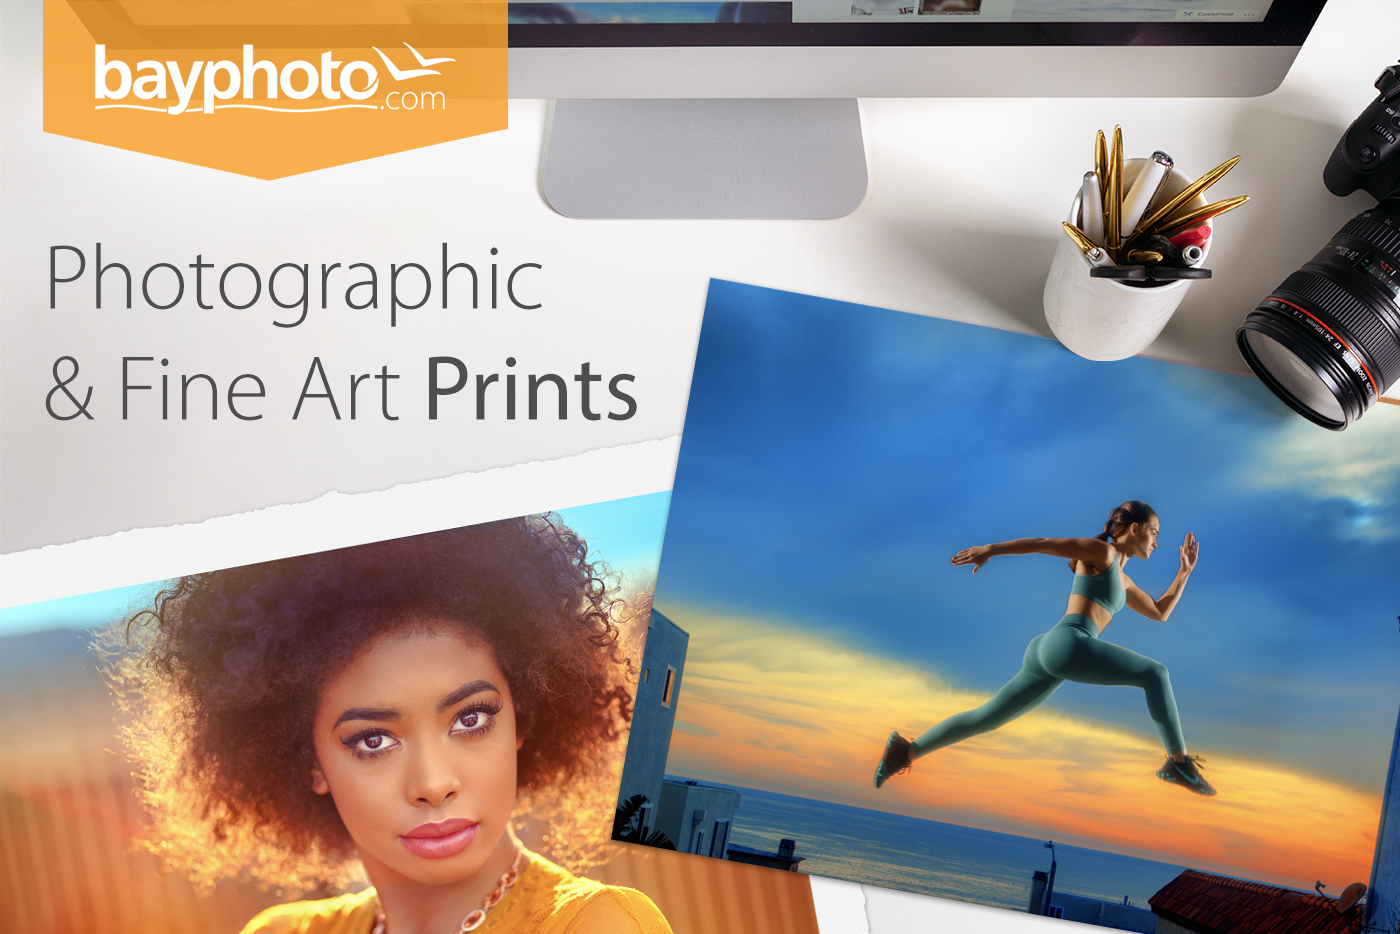 Photographic & Fine Art Prints